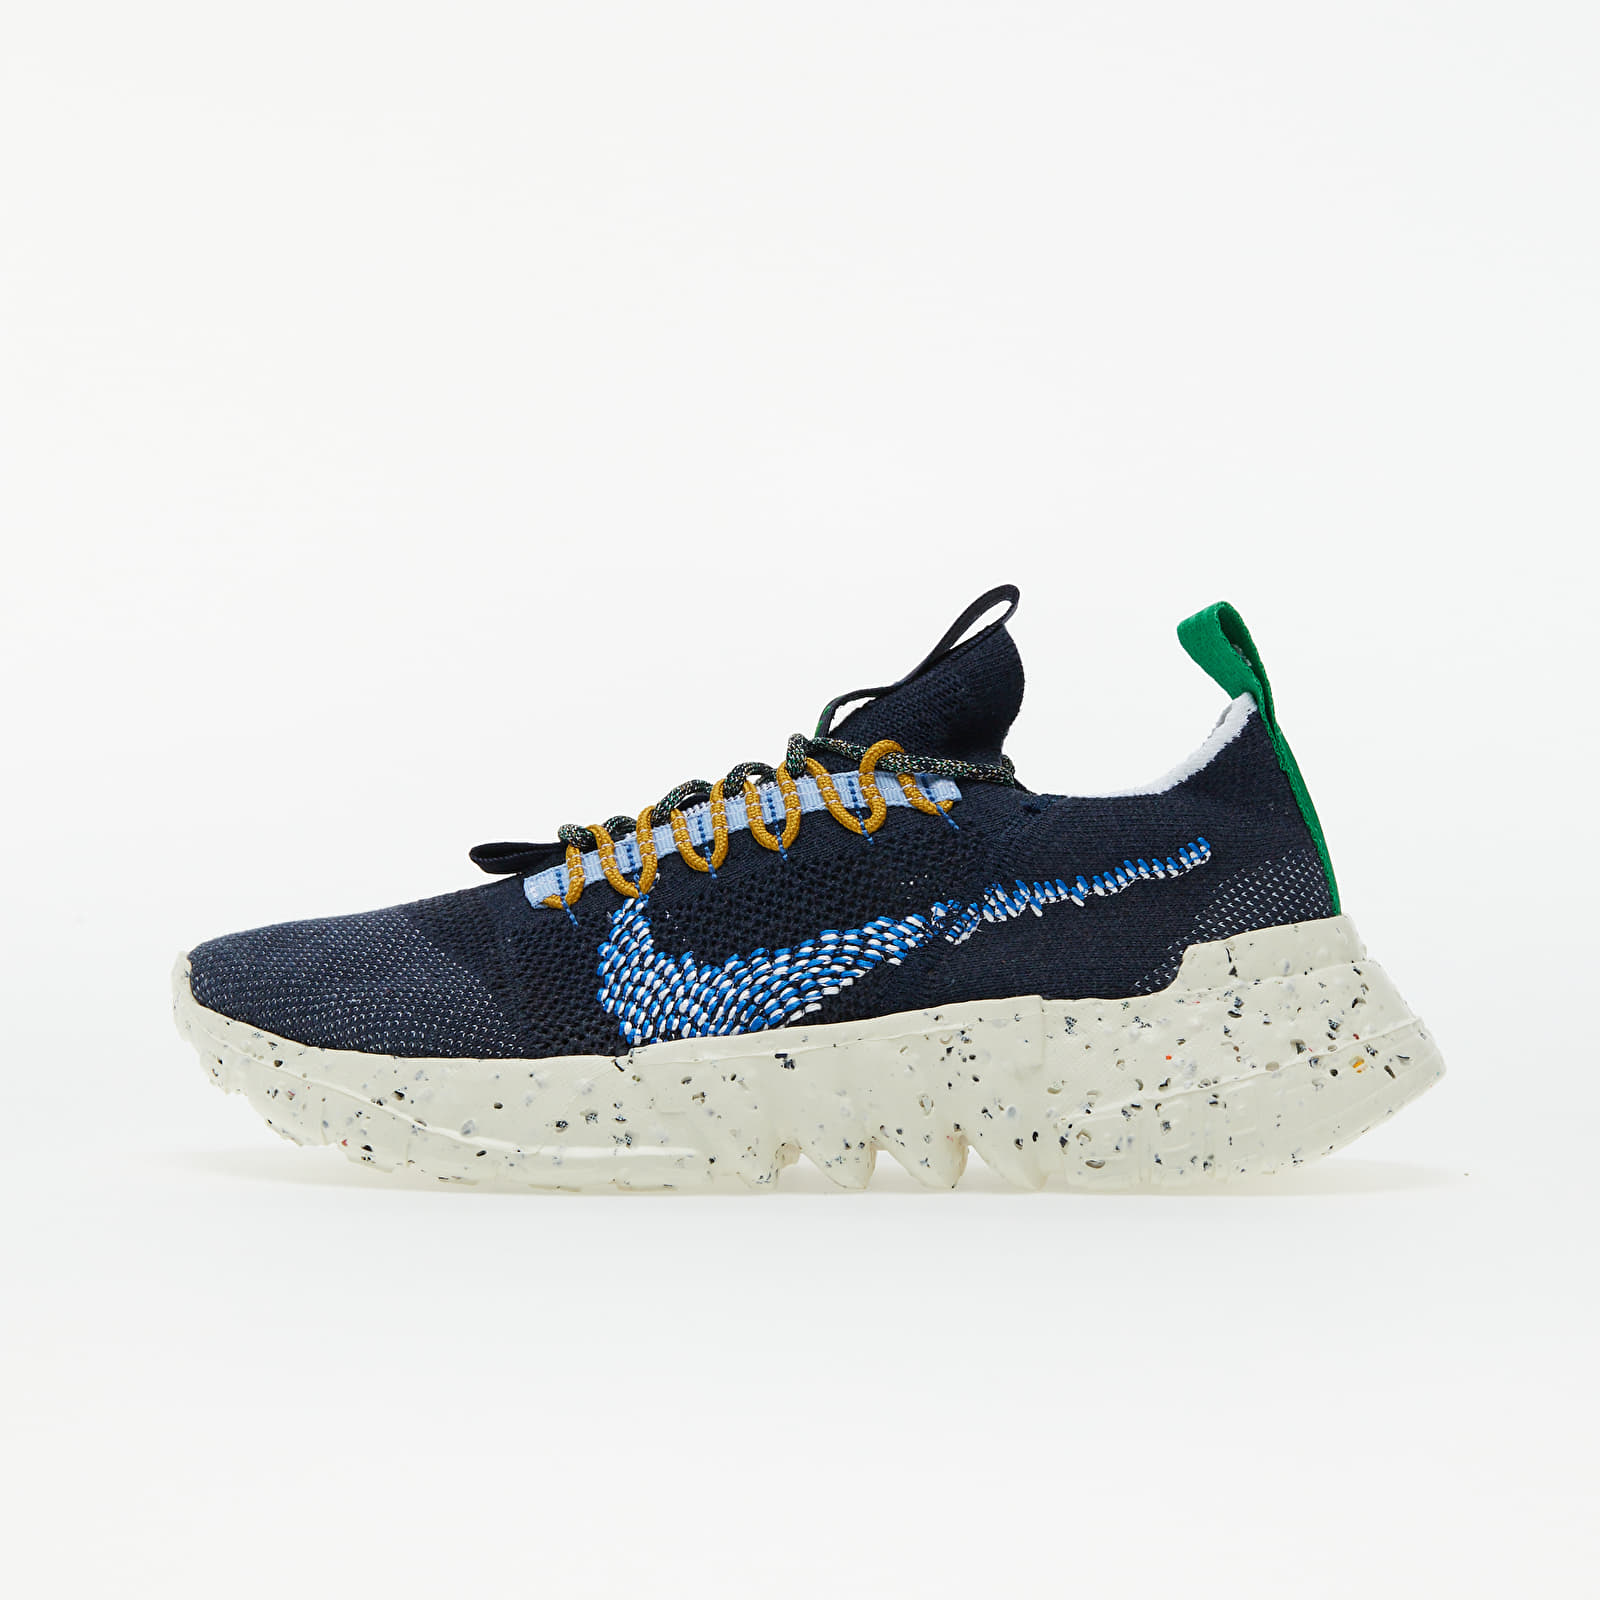 Nike Space Hippie 01 Obsidian/ Signal Blue-Psychic Blue-White DJ3056-400